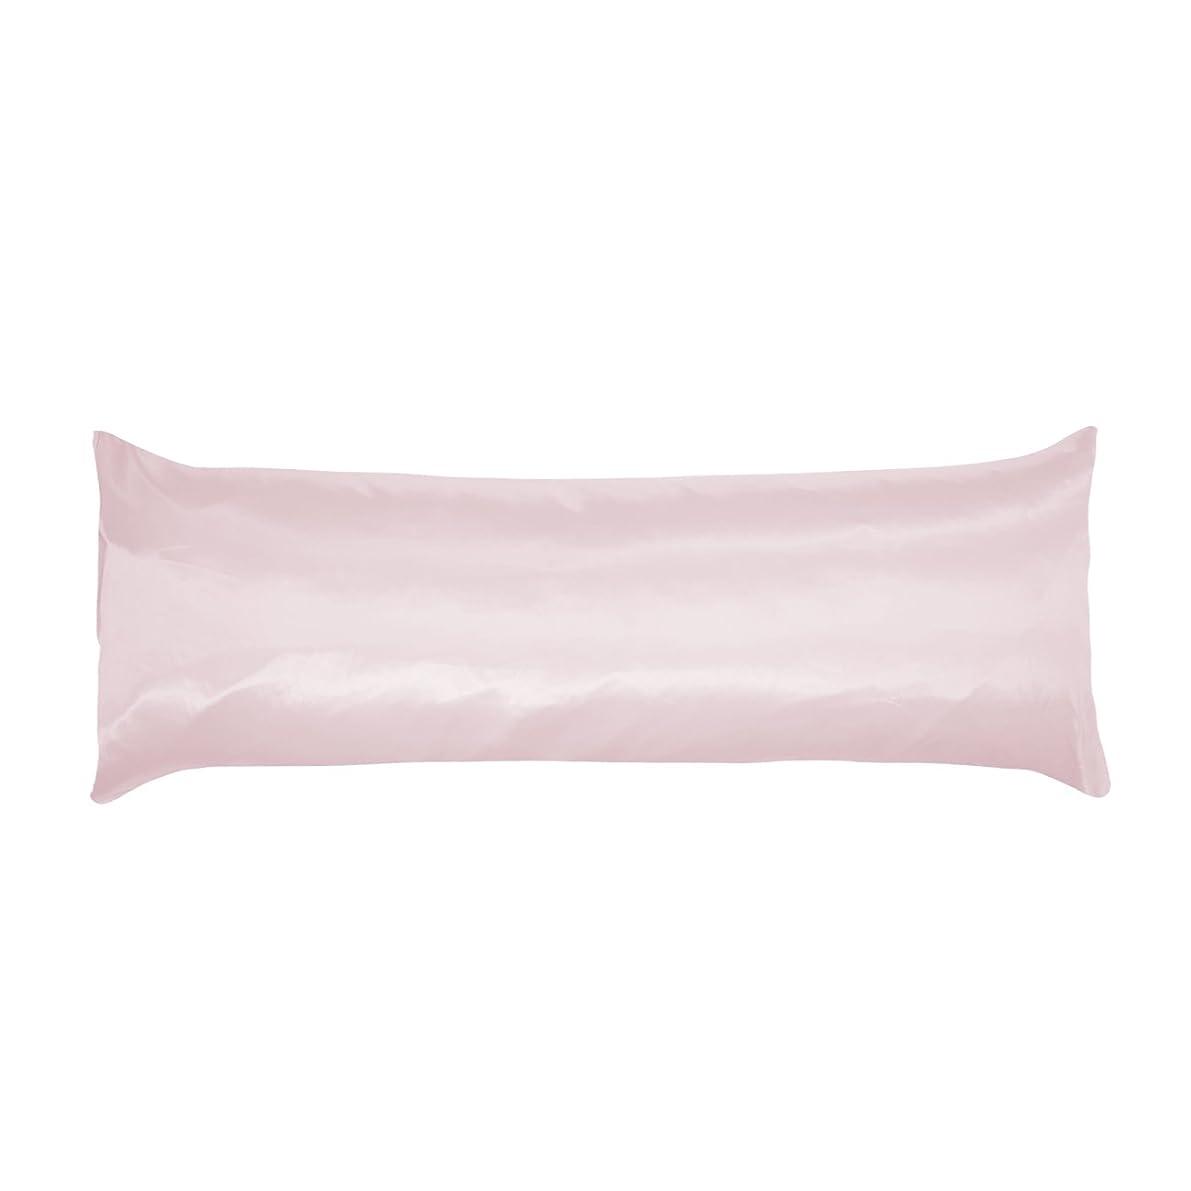 Betty Dain Soft Satin Body Pillowcase, 21 x 54, Pink